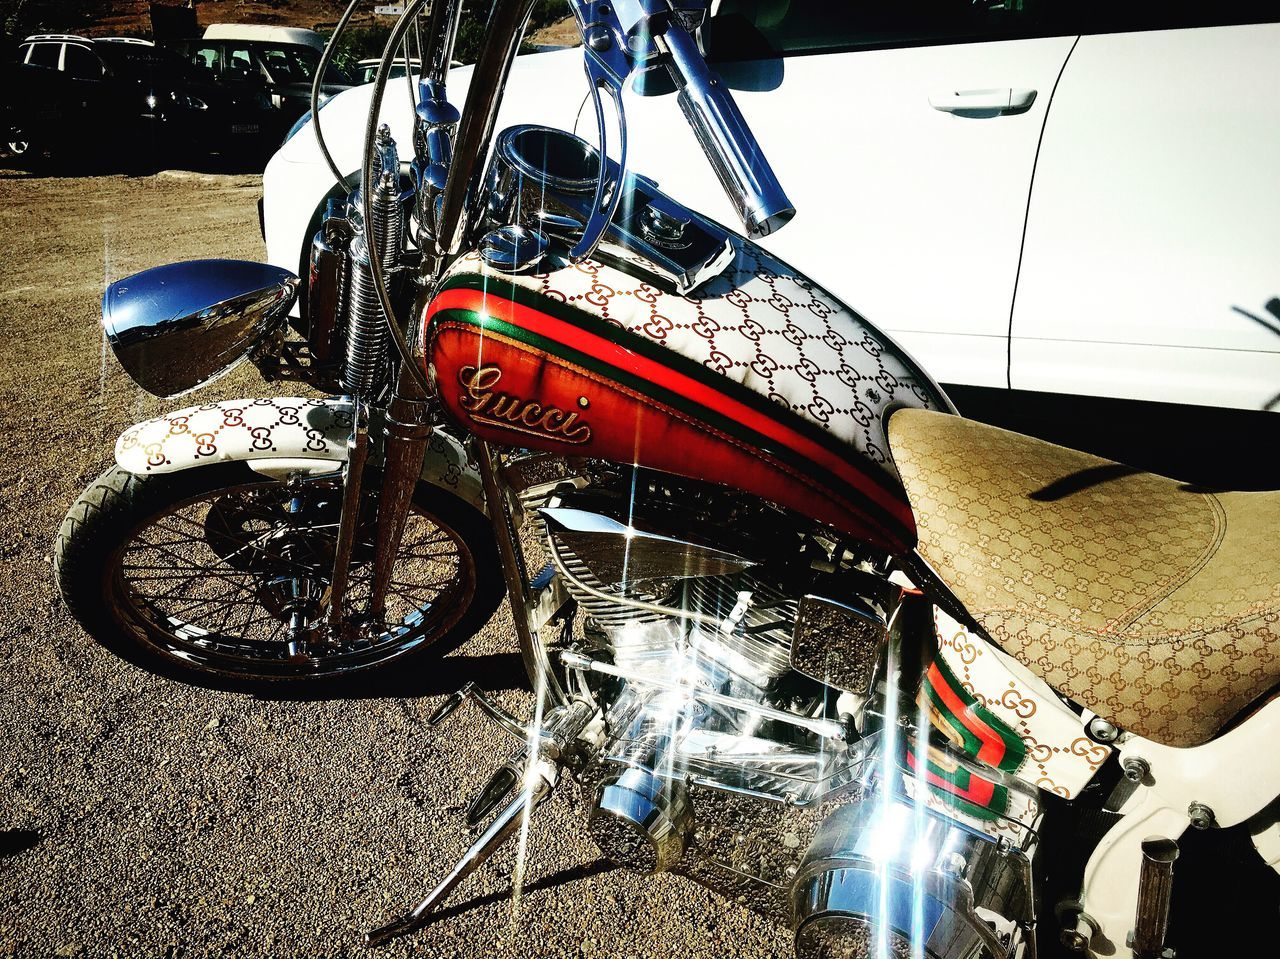 GUCCI Motorcycles Motorcyclepeople Motorbike Mykonos